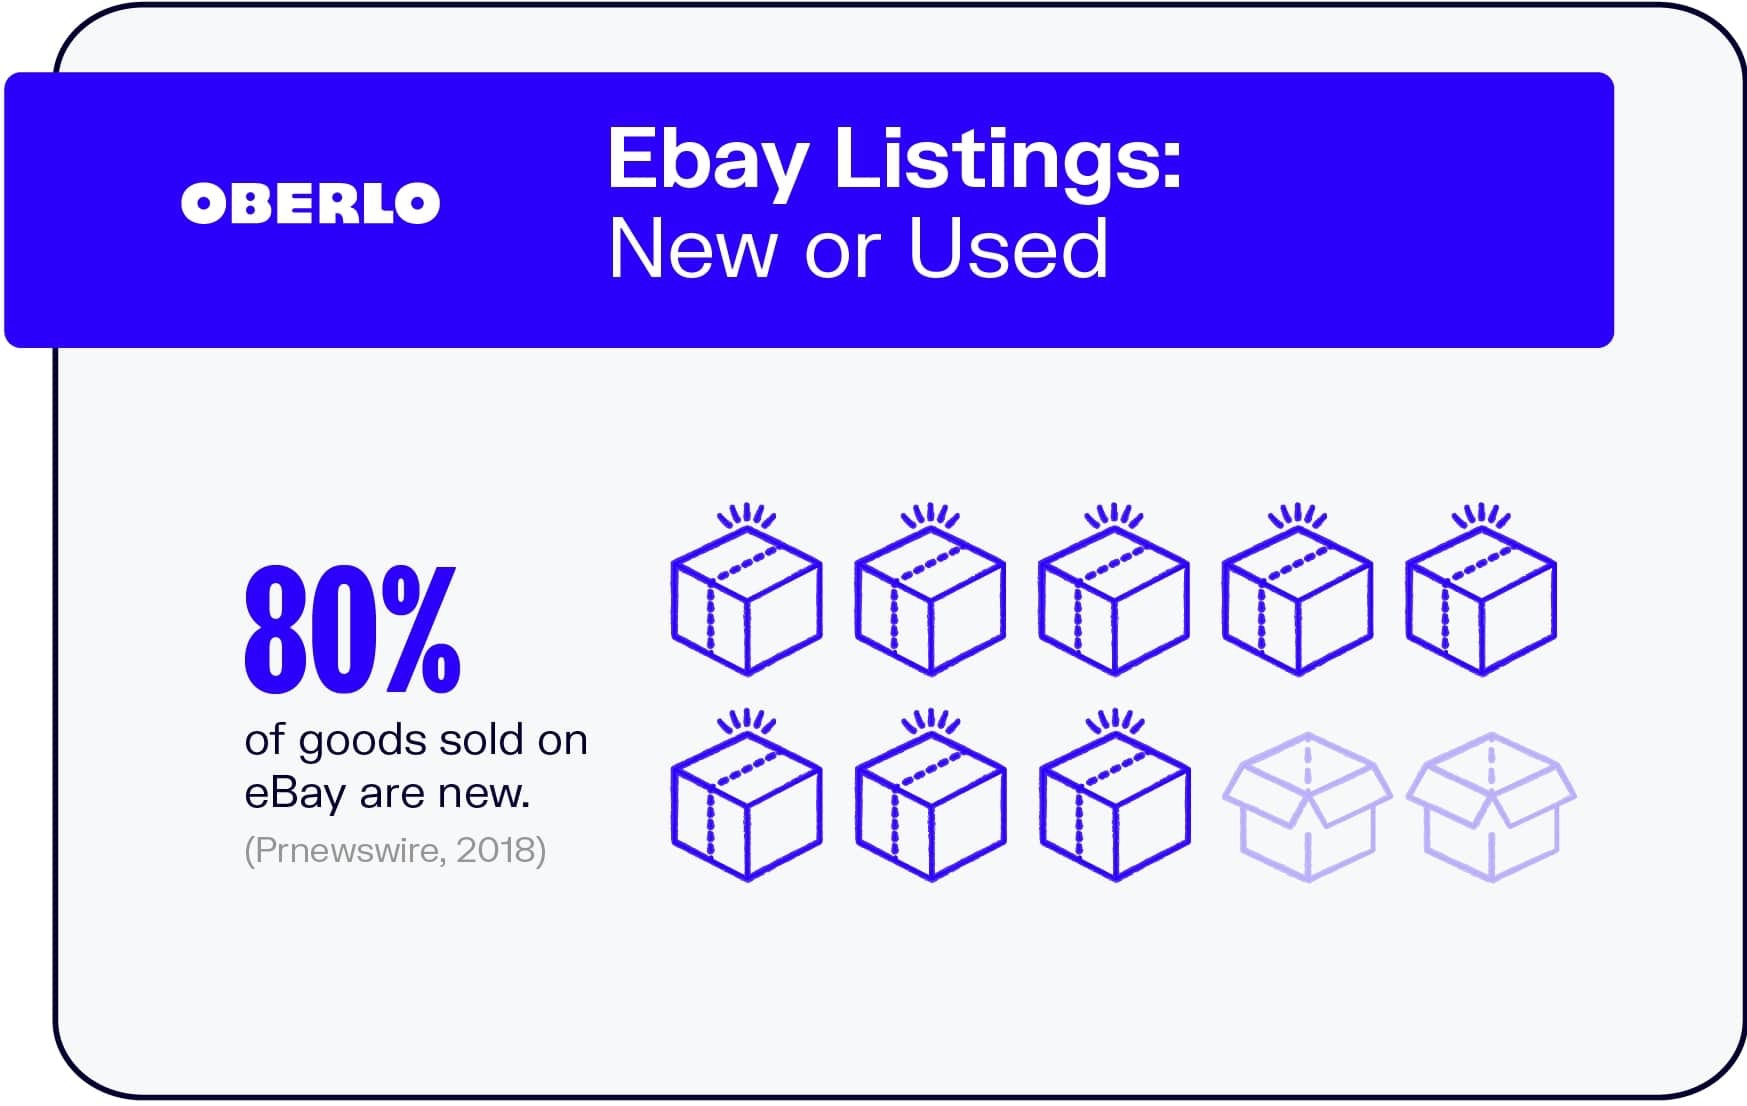 Ebay Listings: New or Used